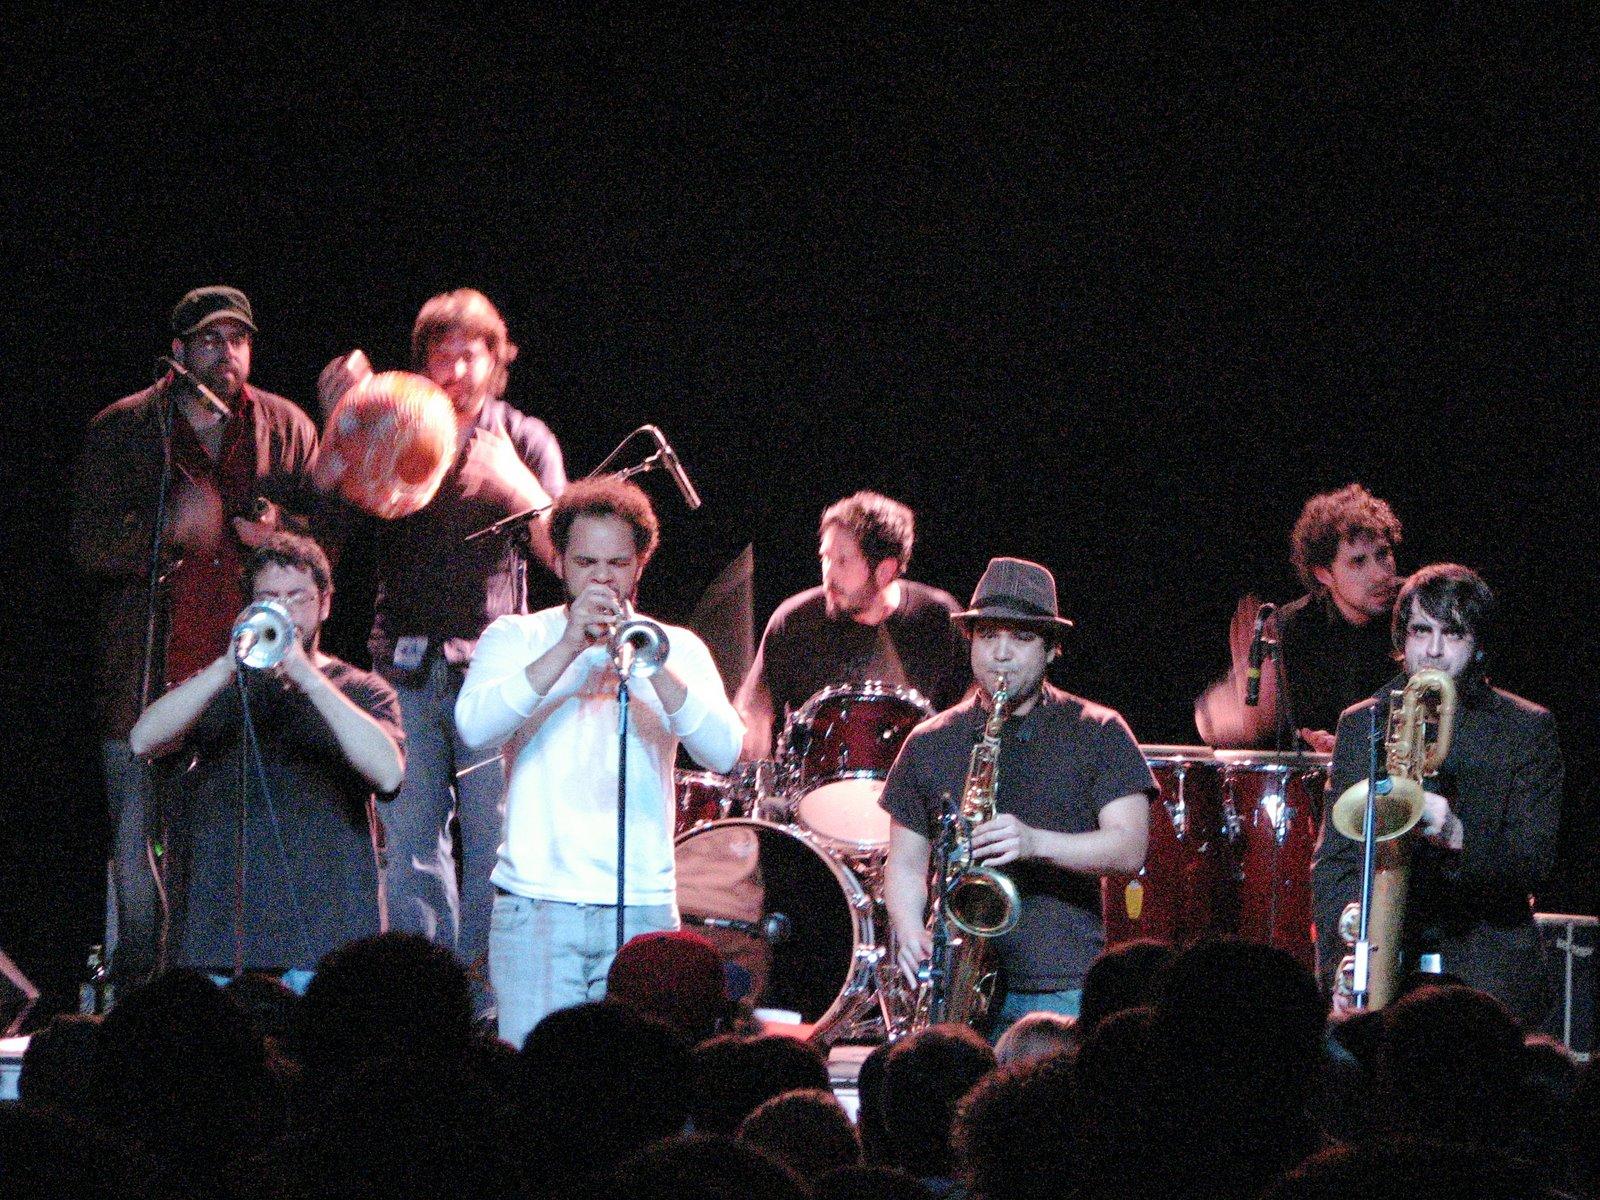 The Budos Band - Maelstrom